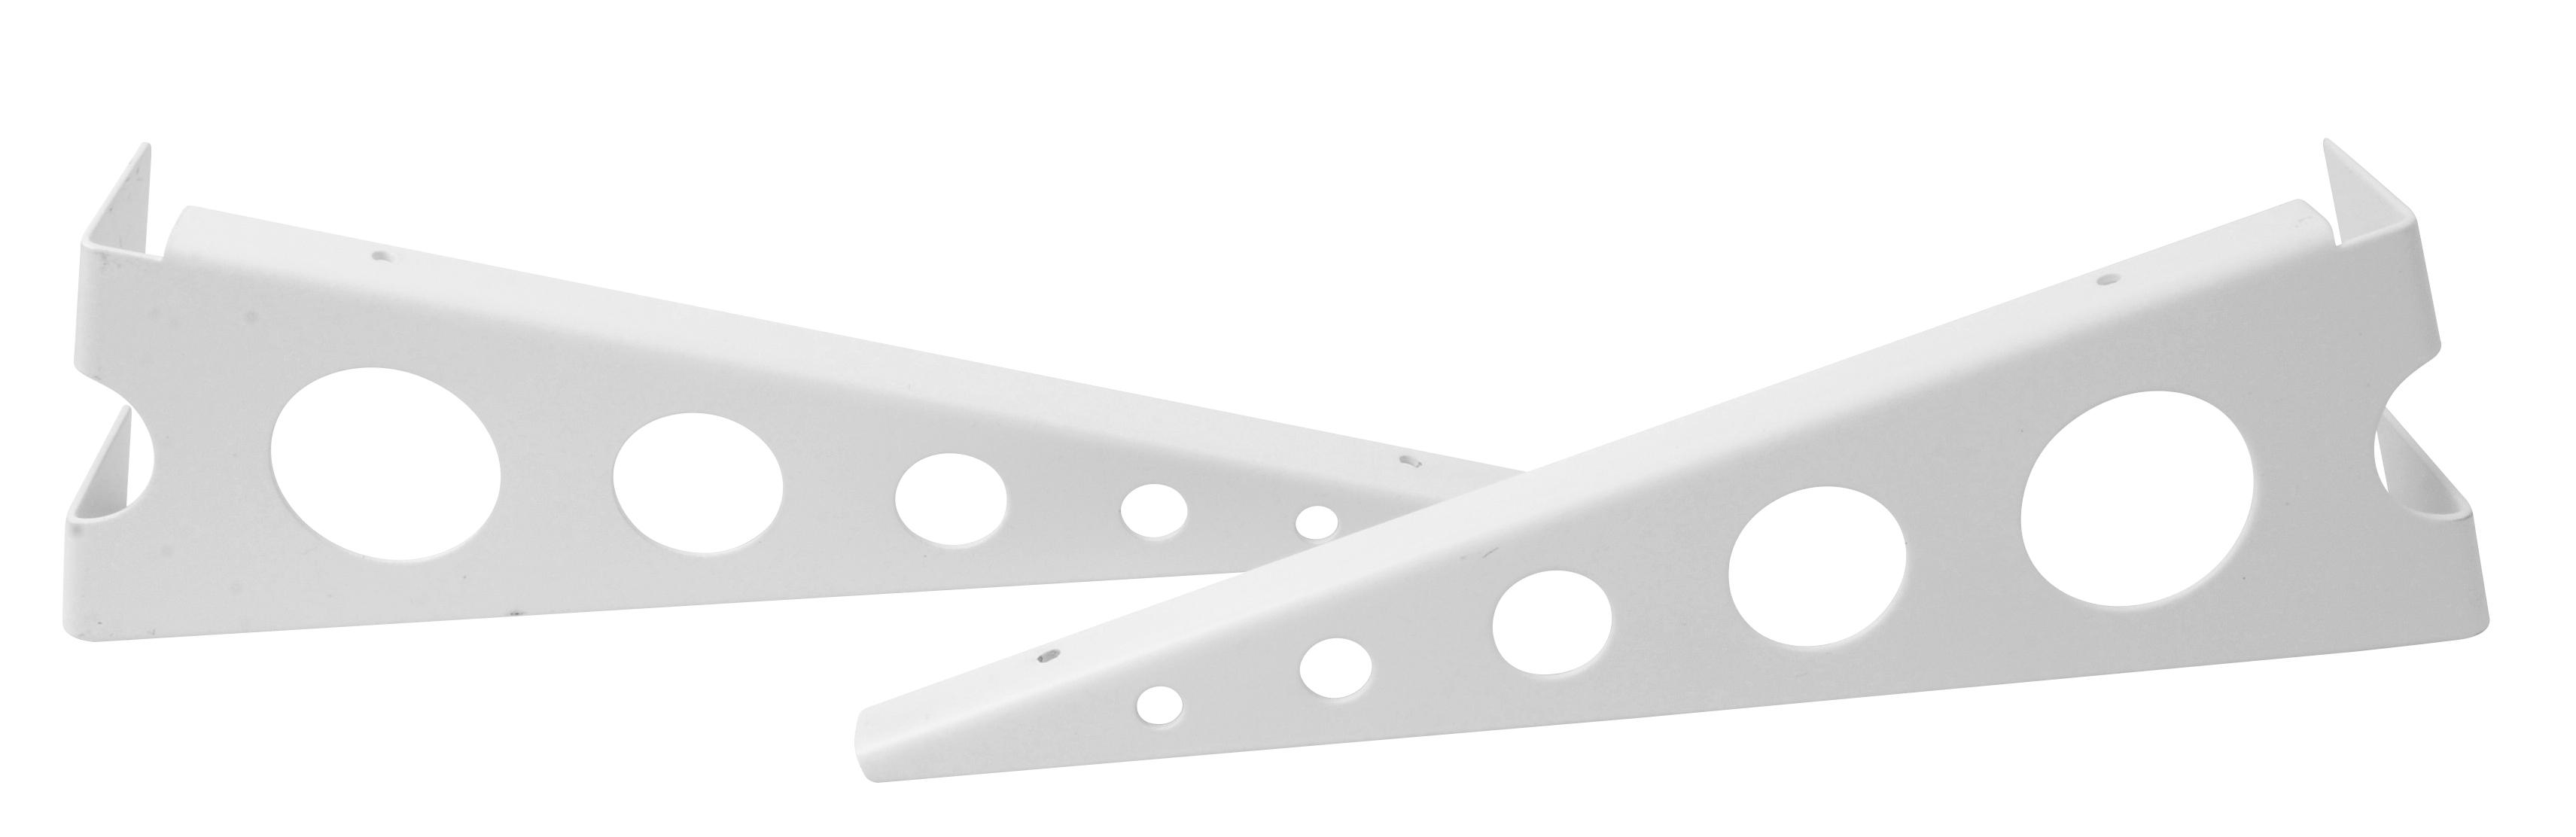 Image of   Hyldeknægt CPH 27 cm. 2 stk. - hvid